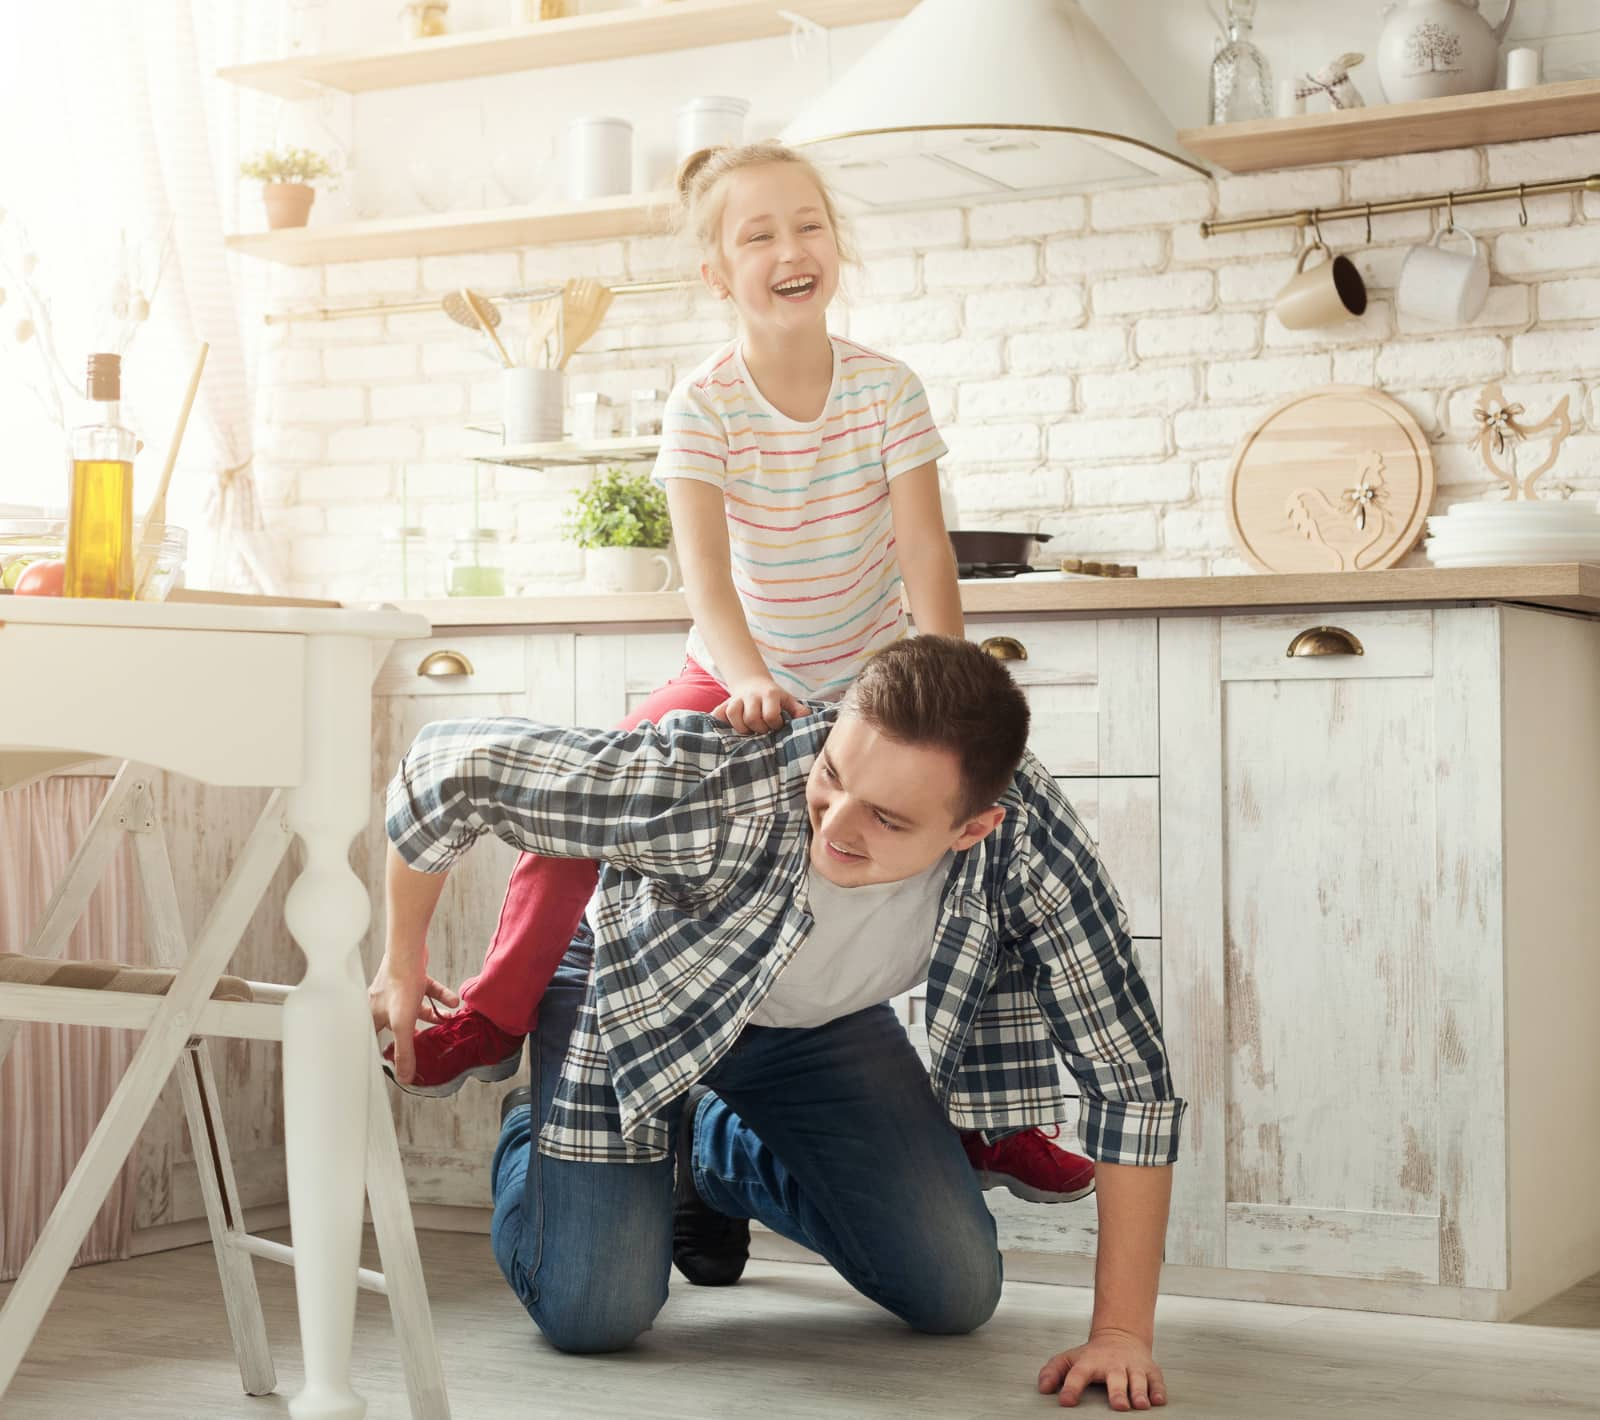 papa rijdt paarje met dochter in keuken